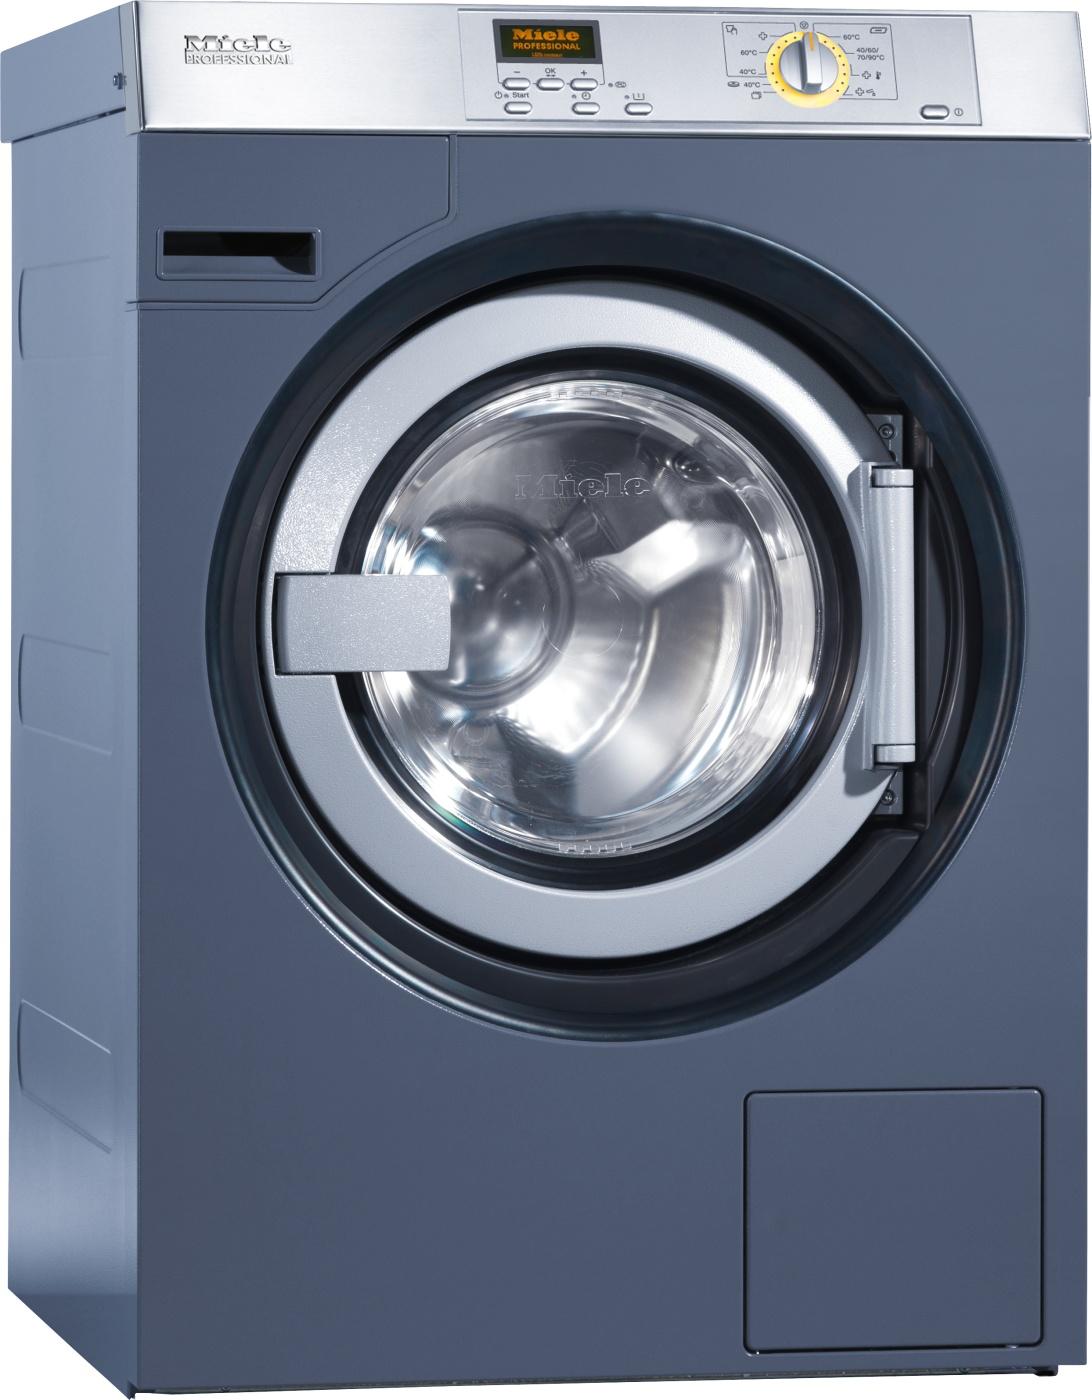 Miele Waschmaschine PW 5104 Mopstar 100